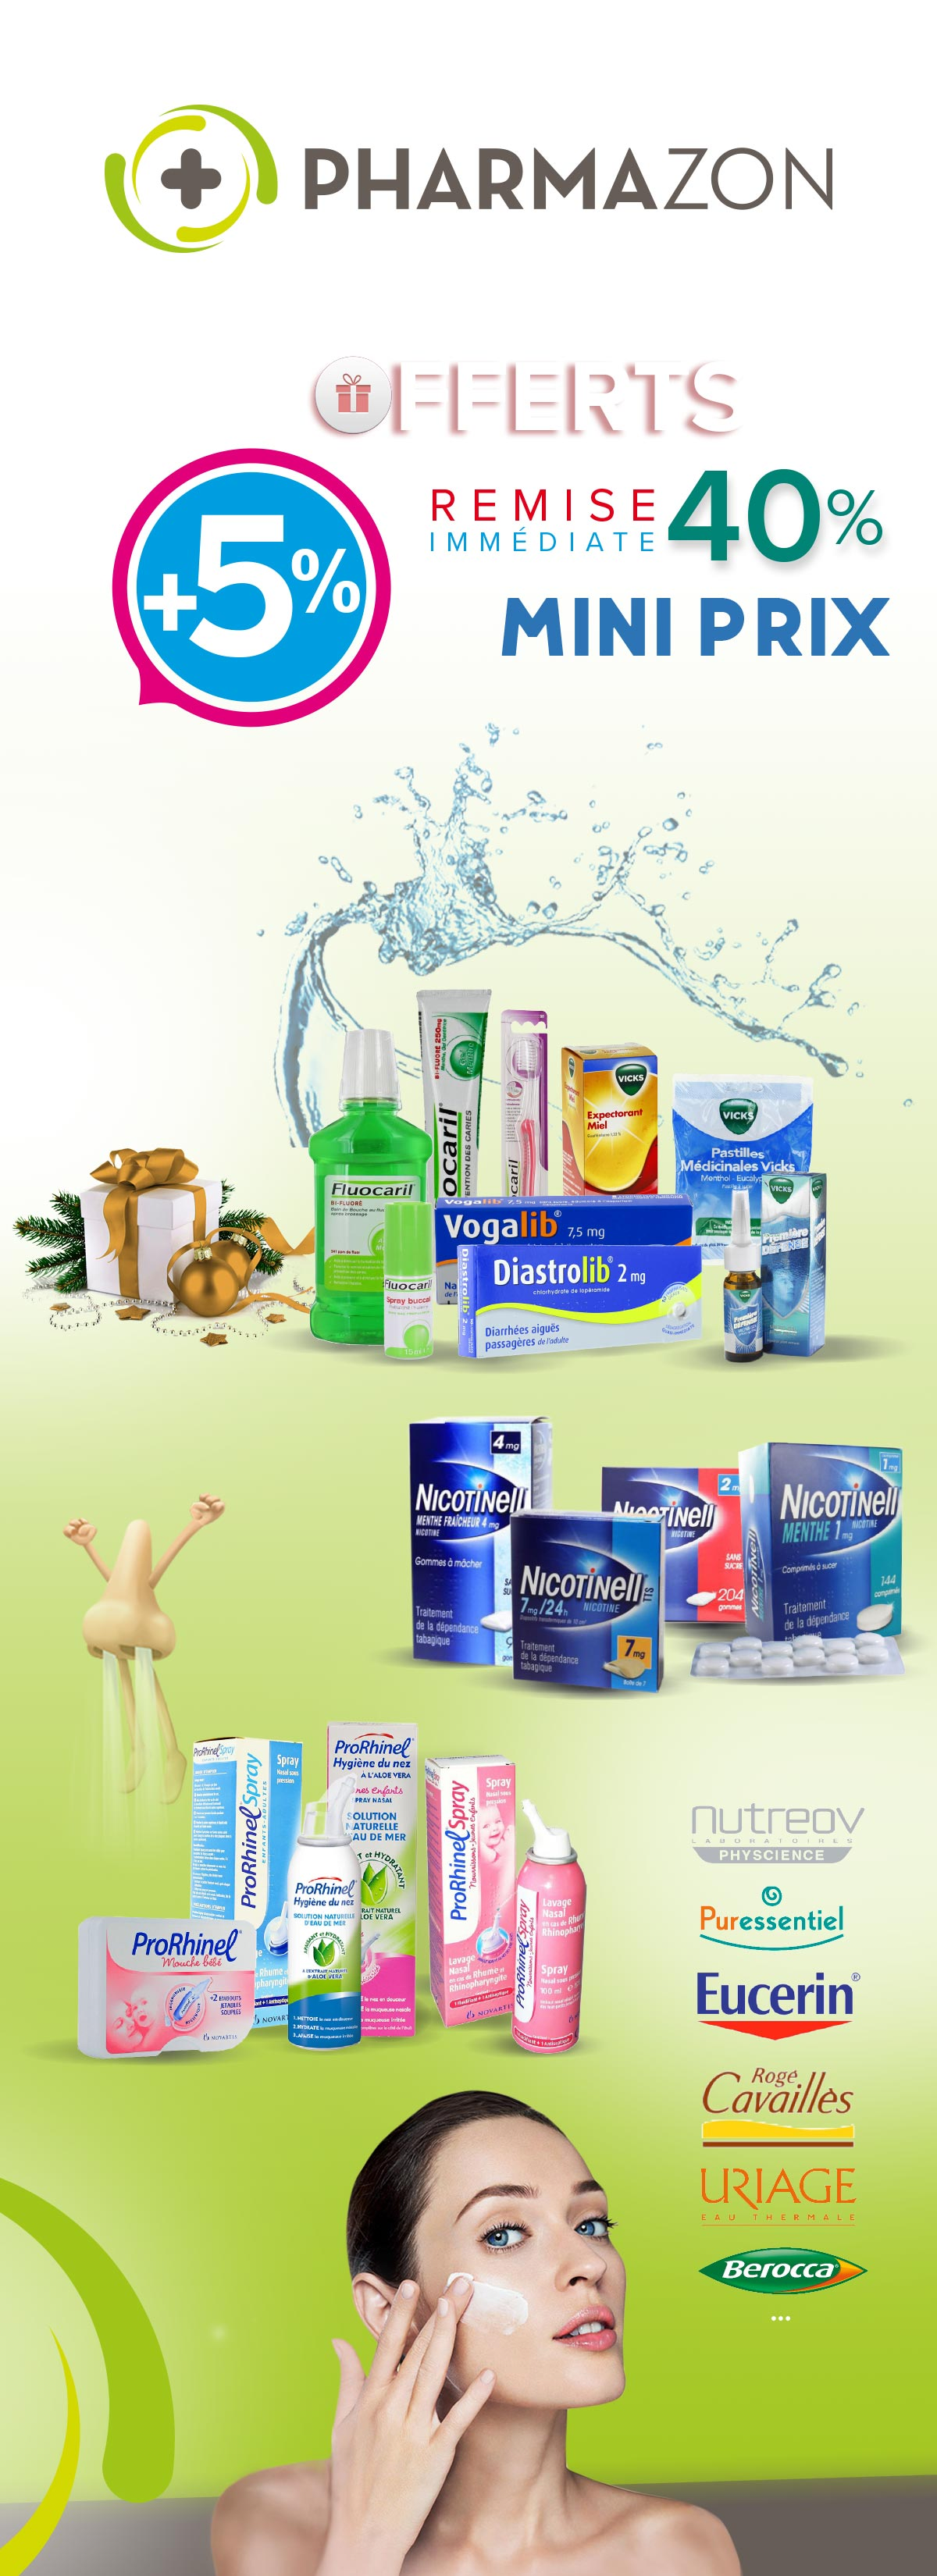 Branding, Pharmazon, produits pharmaceutiques, logo, web design, print, app, idée, ui/ux, marque, communication,